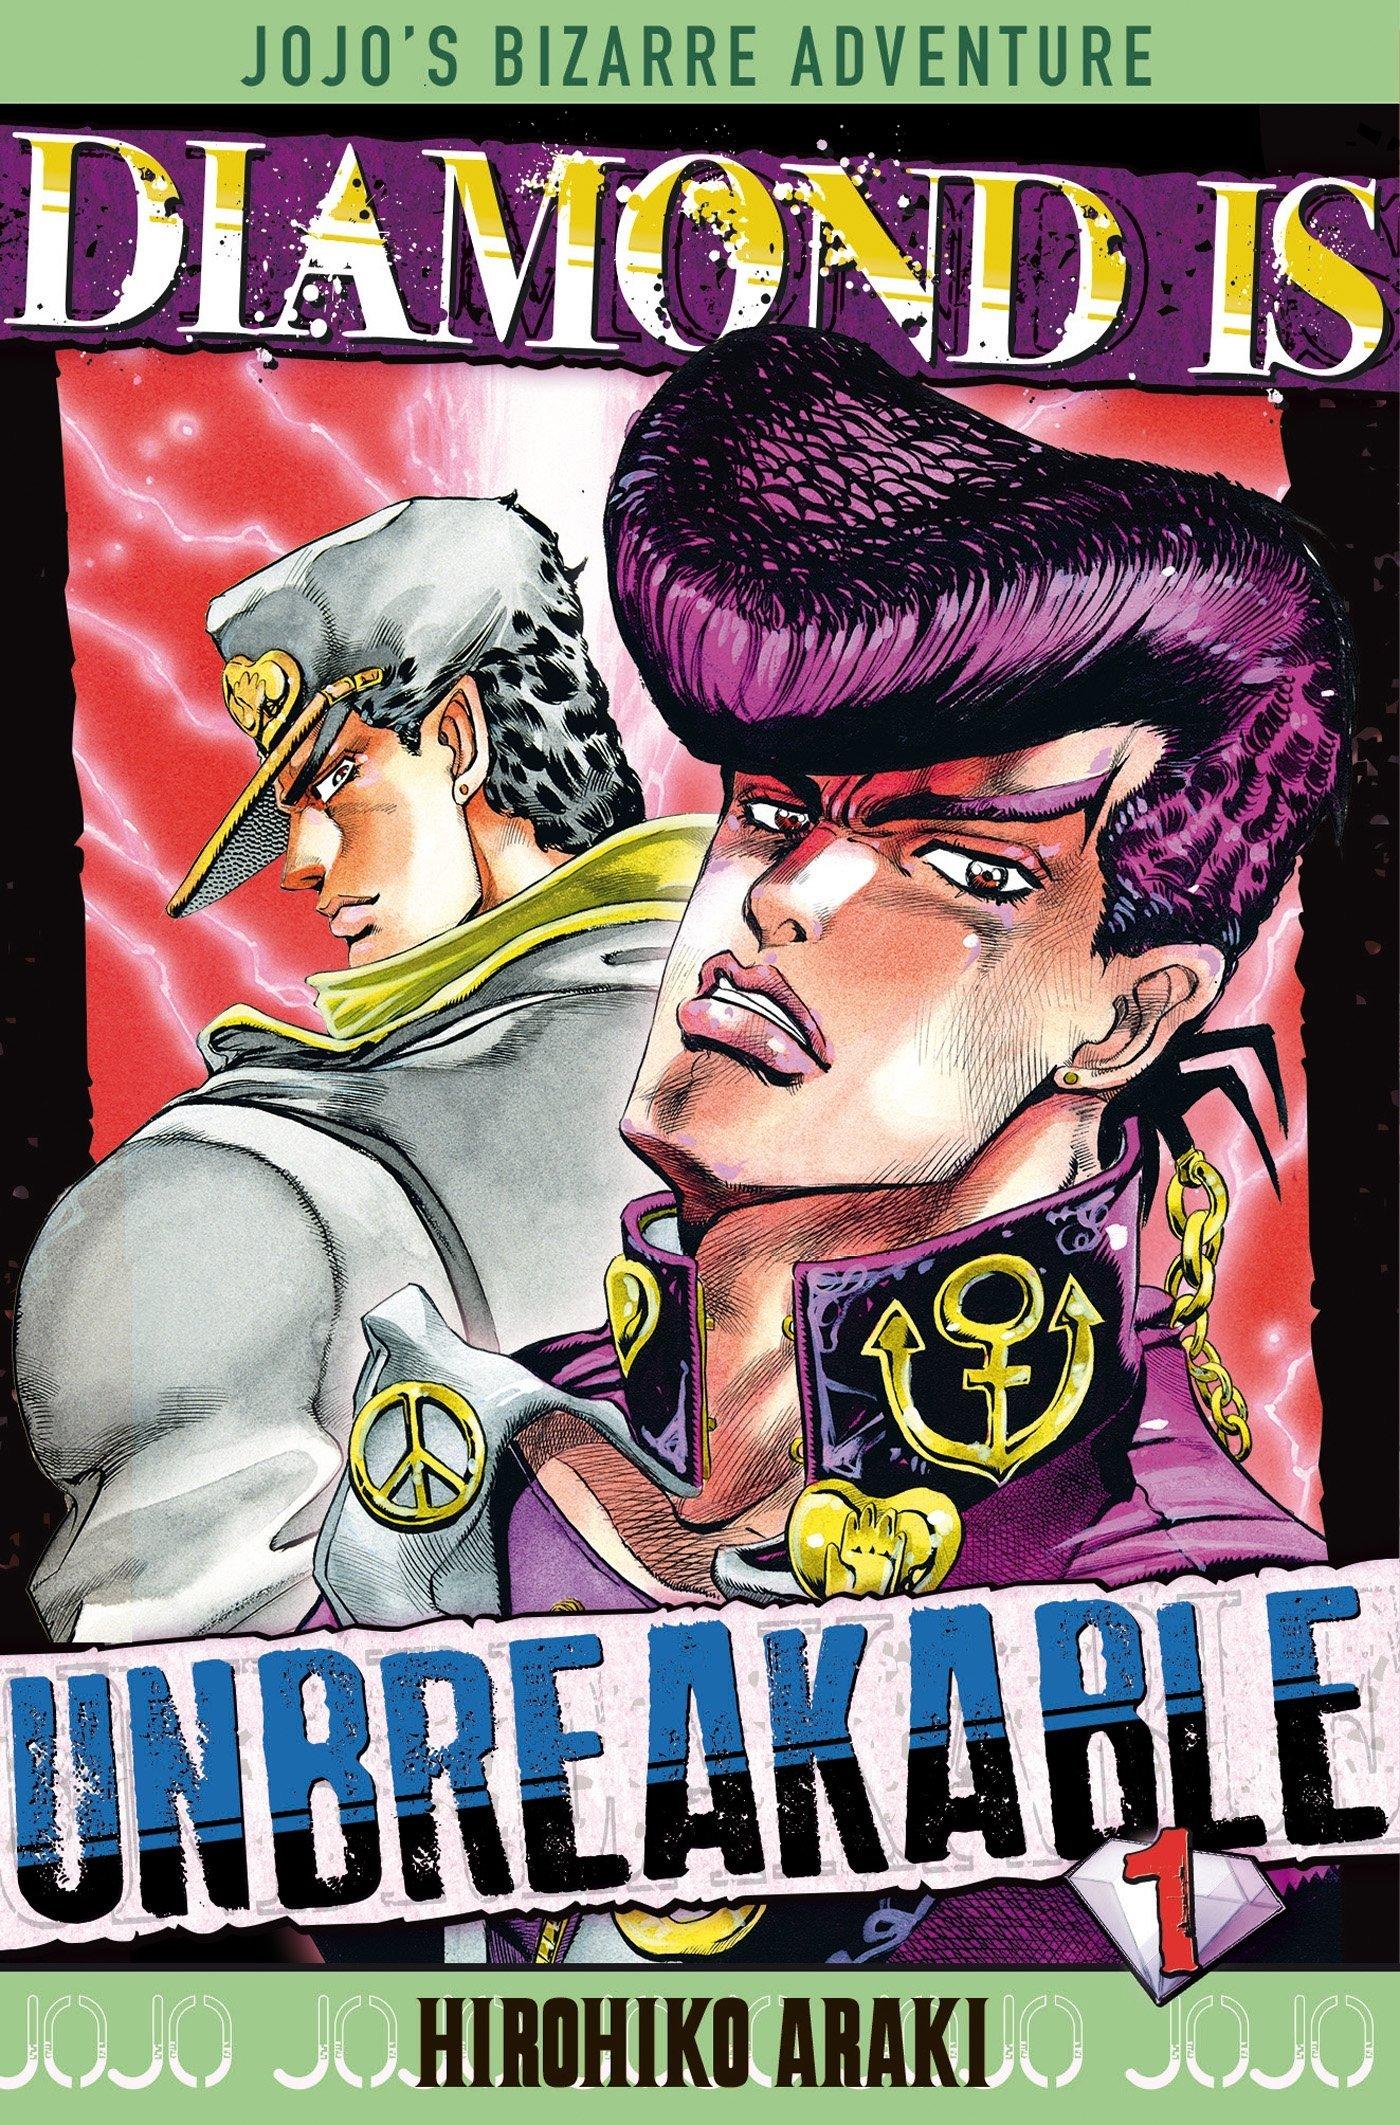 Jojo's Bizarre Adventure: Diamond is Unbreakable,  tome 1